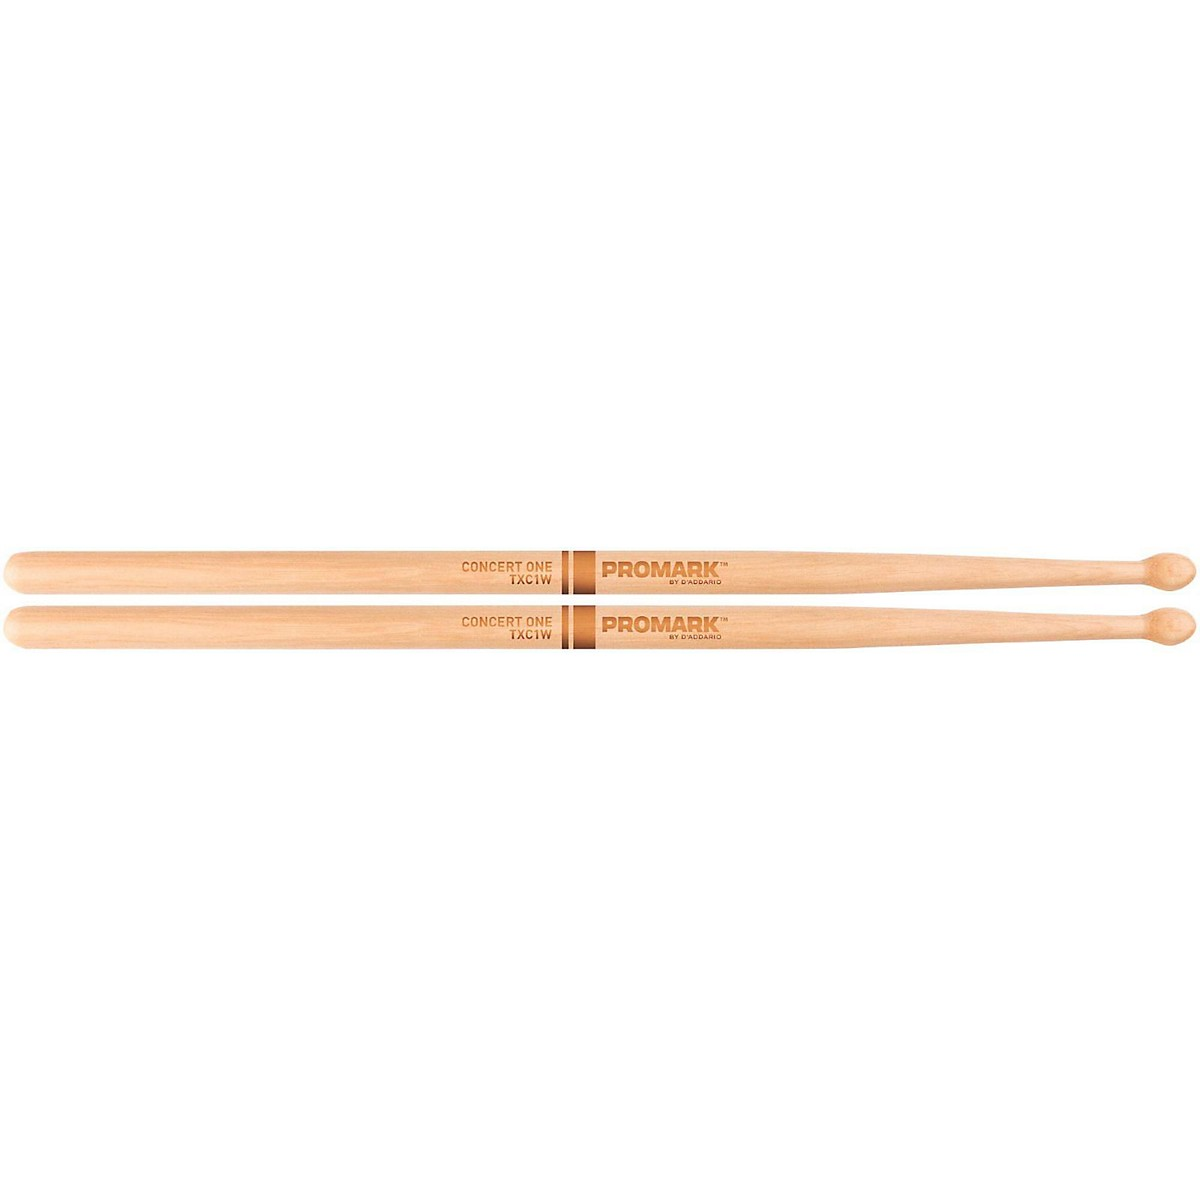 Promark Concert One Snare Drum Stick